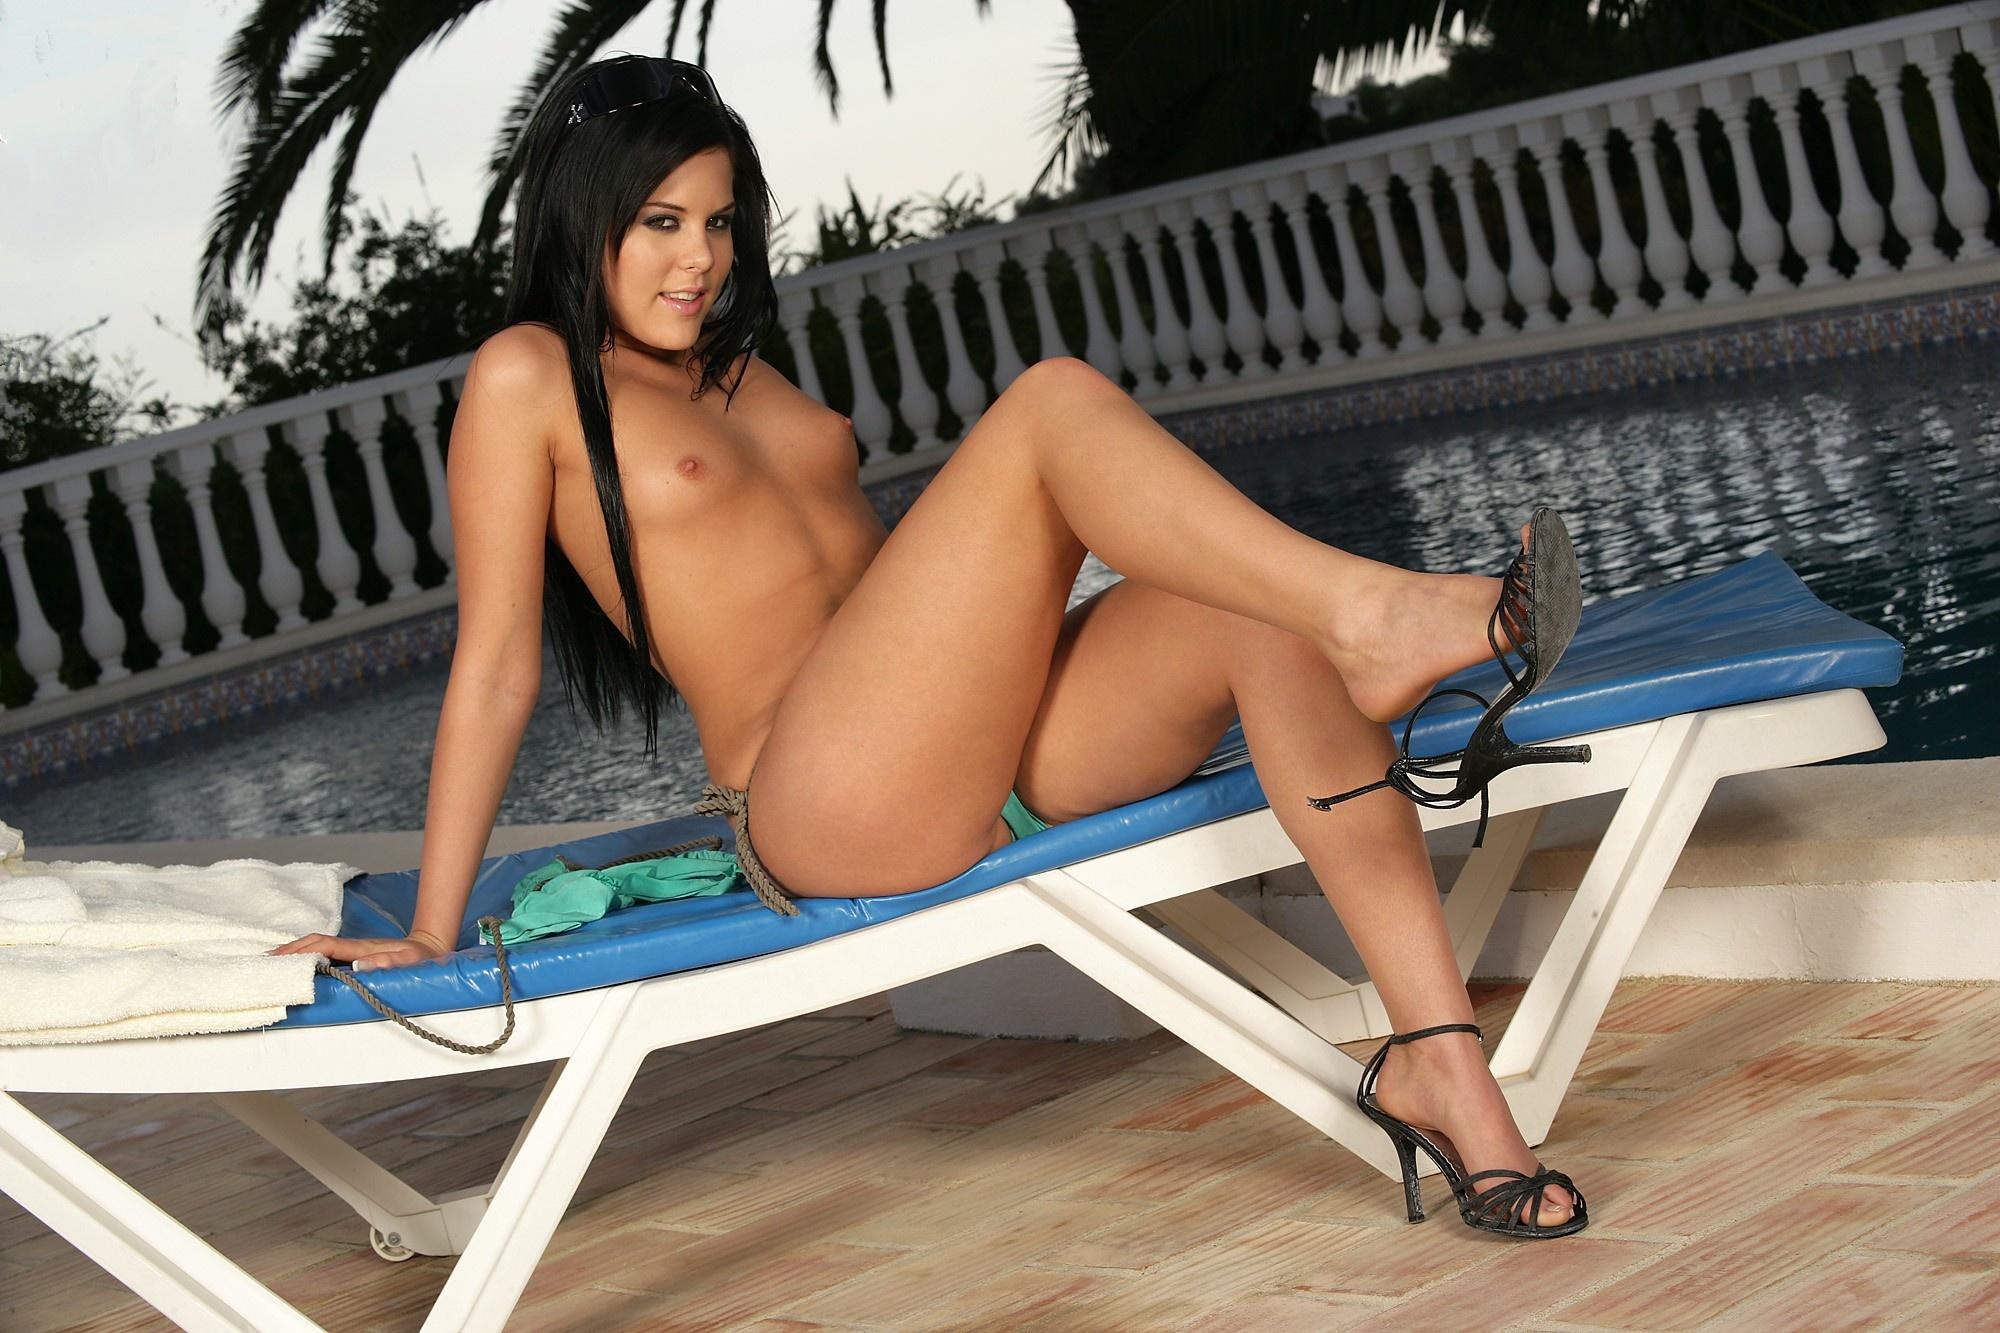 Vanessa mature pornstar